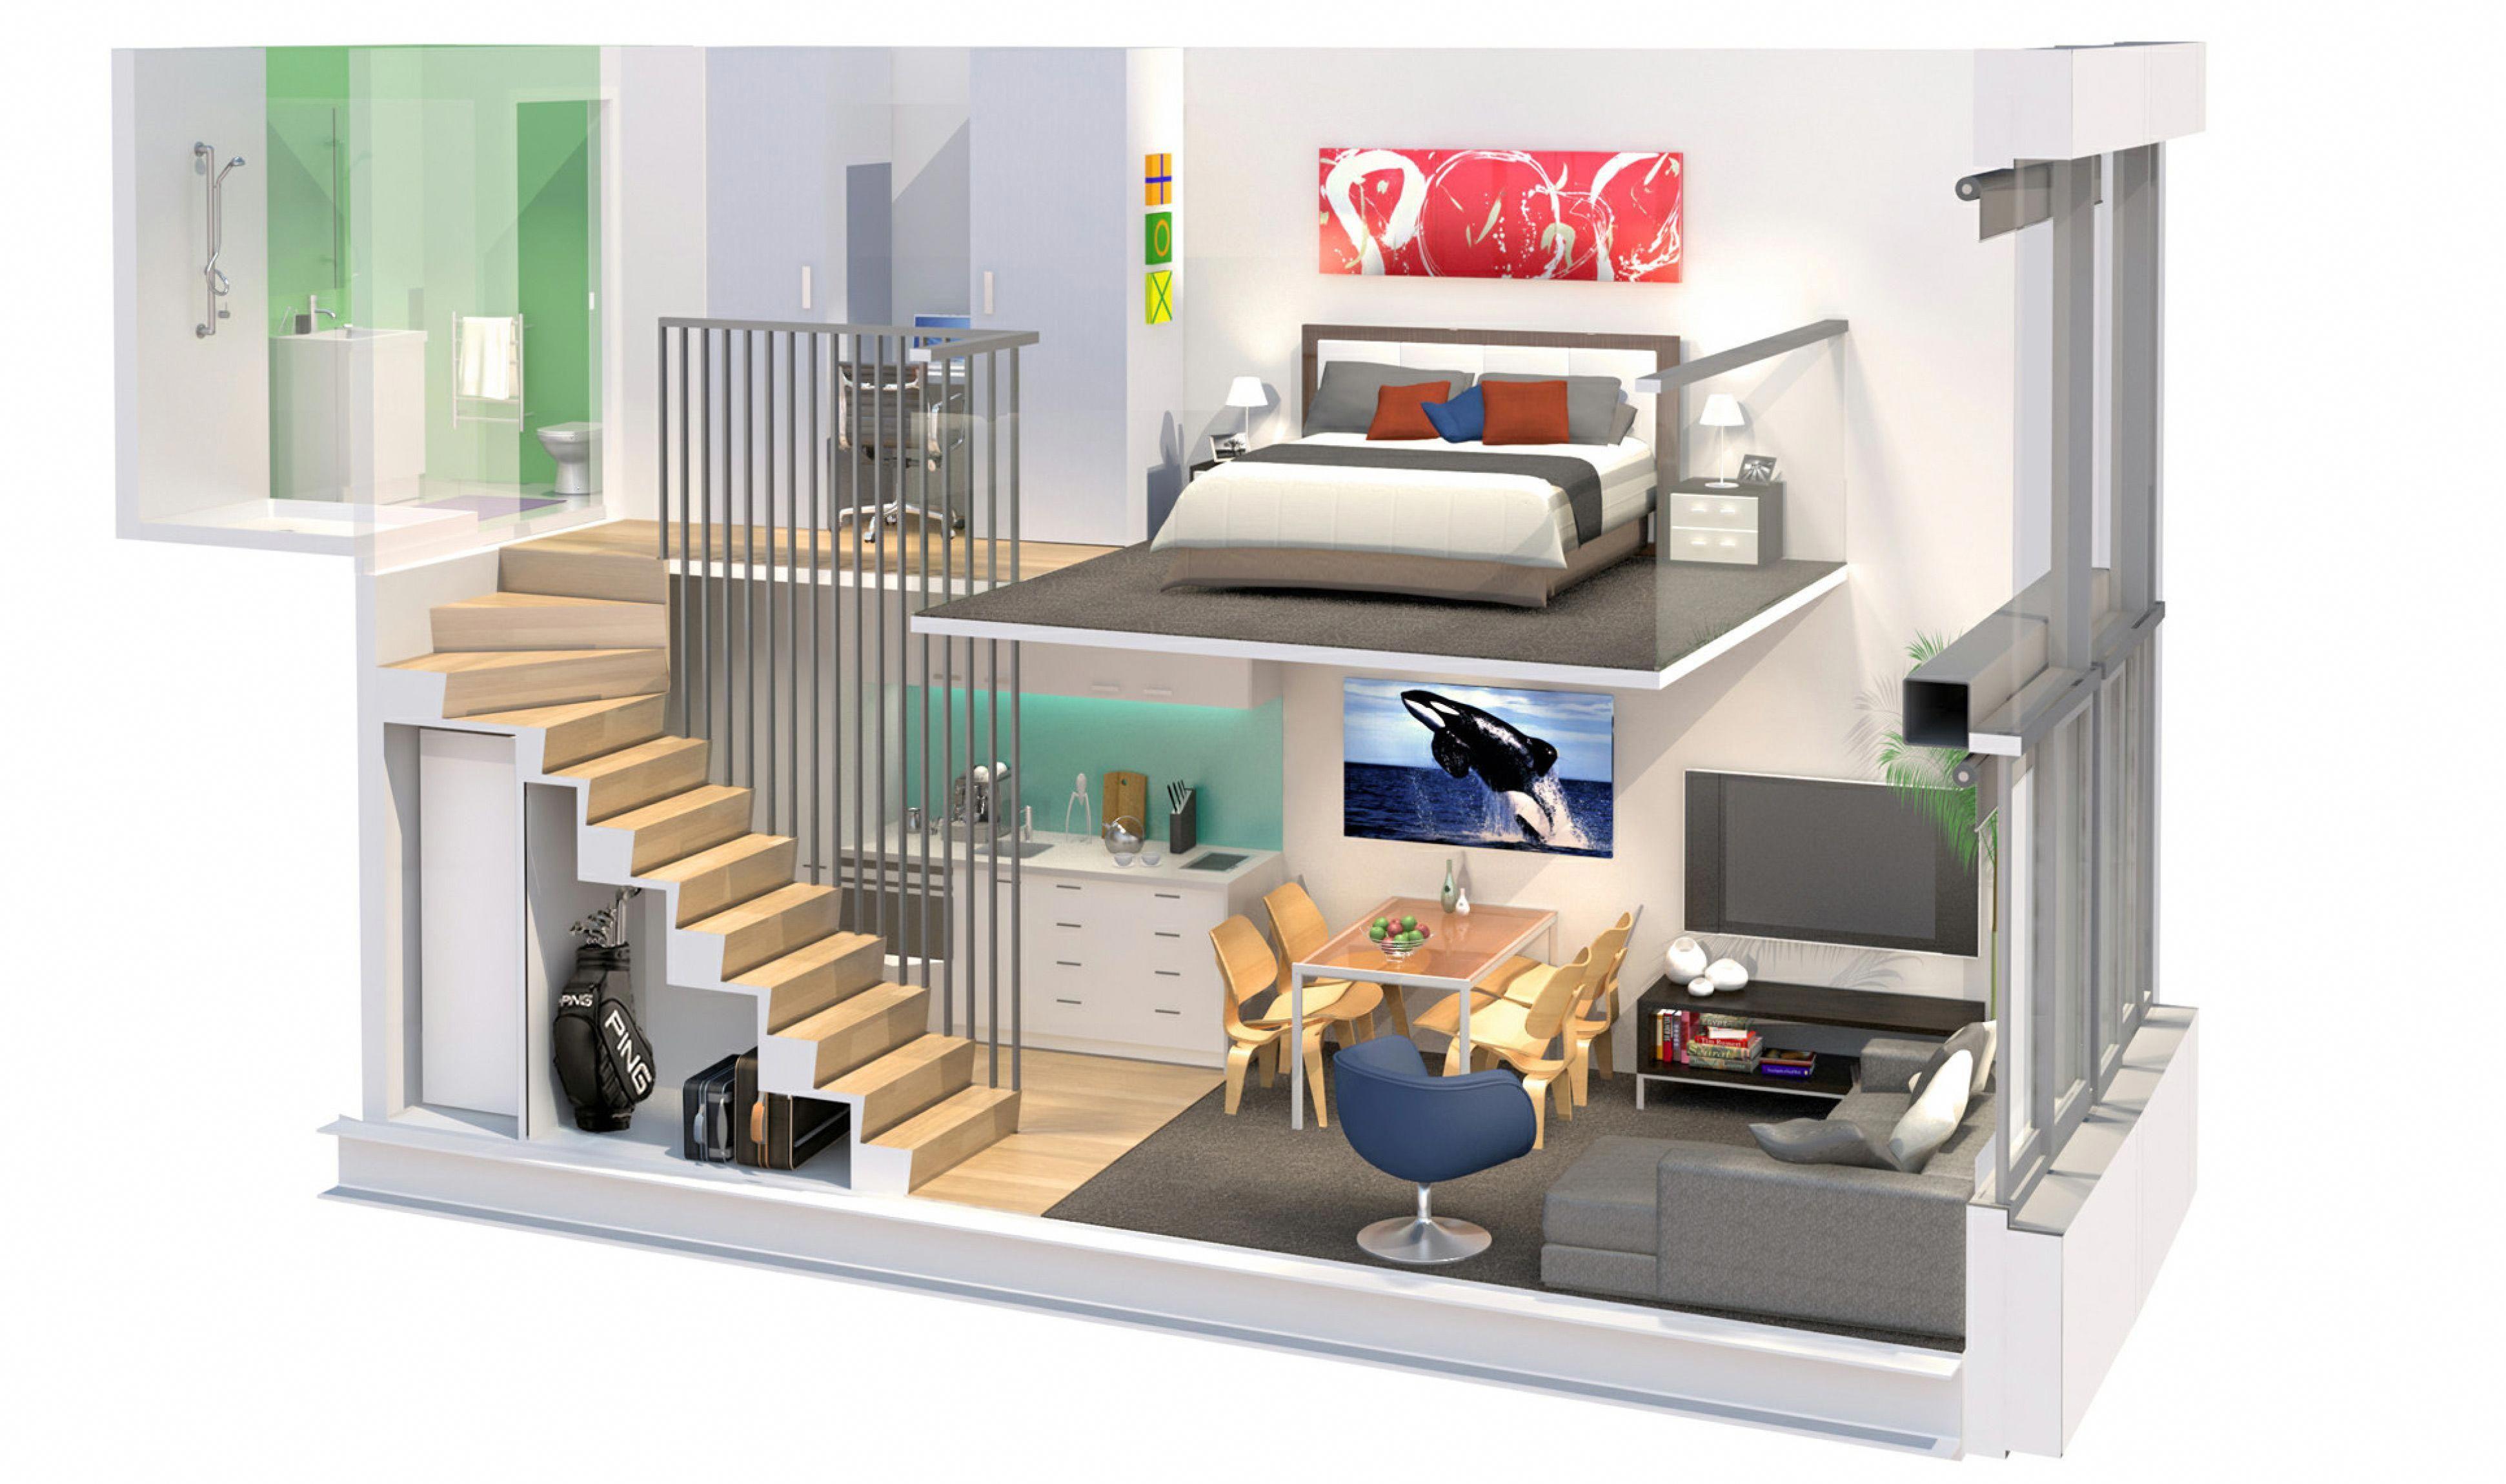 3dunit Bathroomshapelayout Tiny House Design Studio Loft